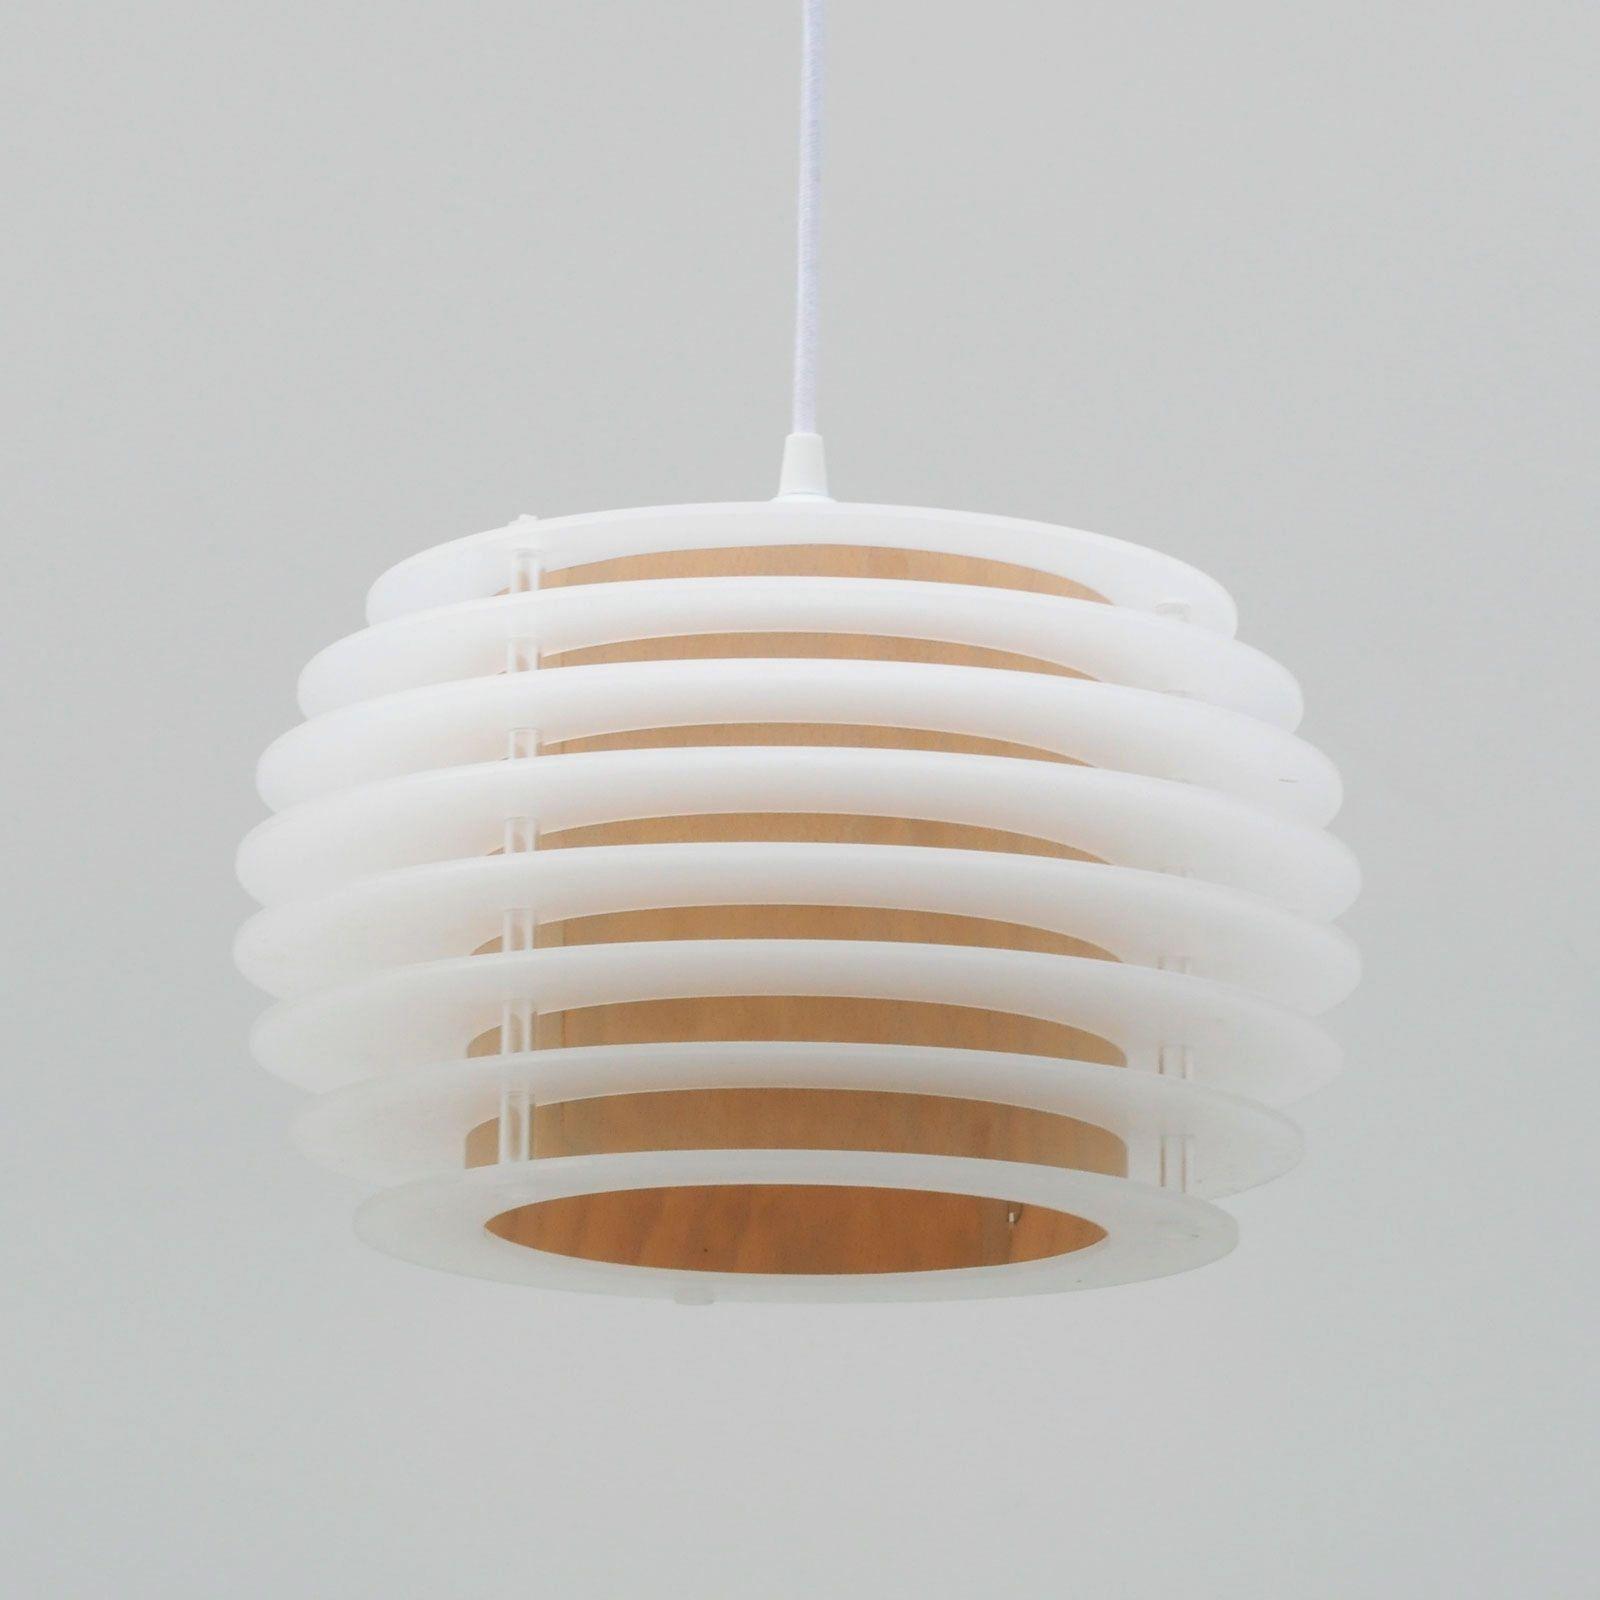 a41afd8ce750f82e430267f75a79b07b Schöne Lampe Mit Mehreren Lampenschirmen Dekorationen